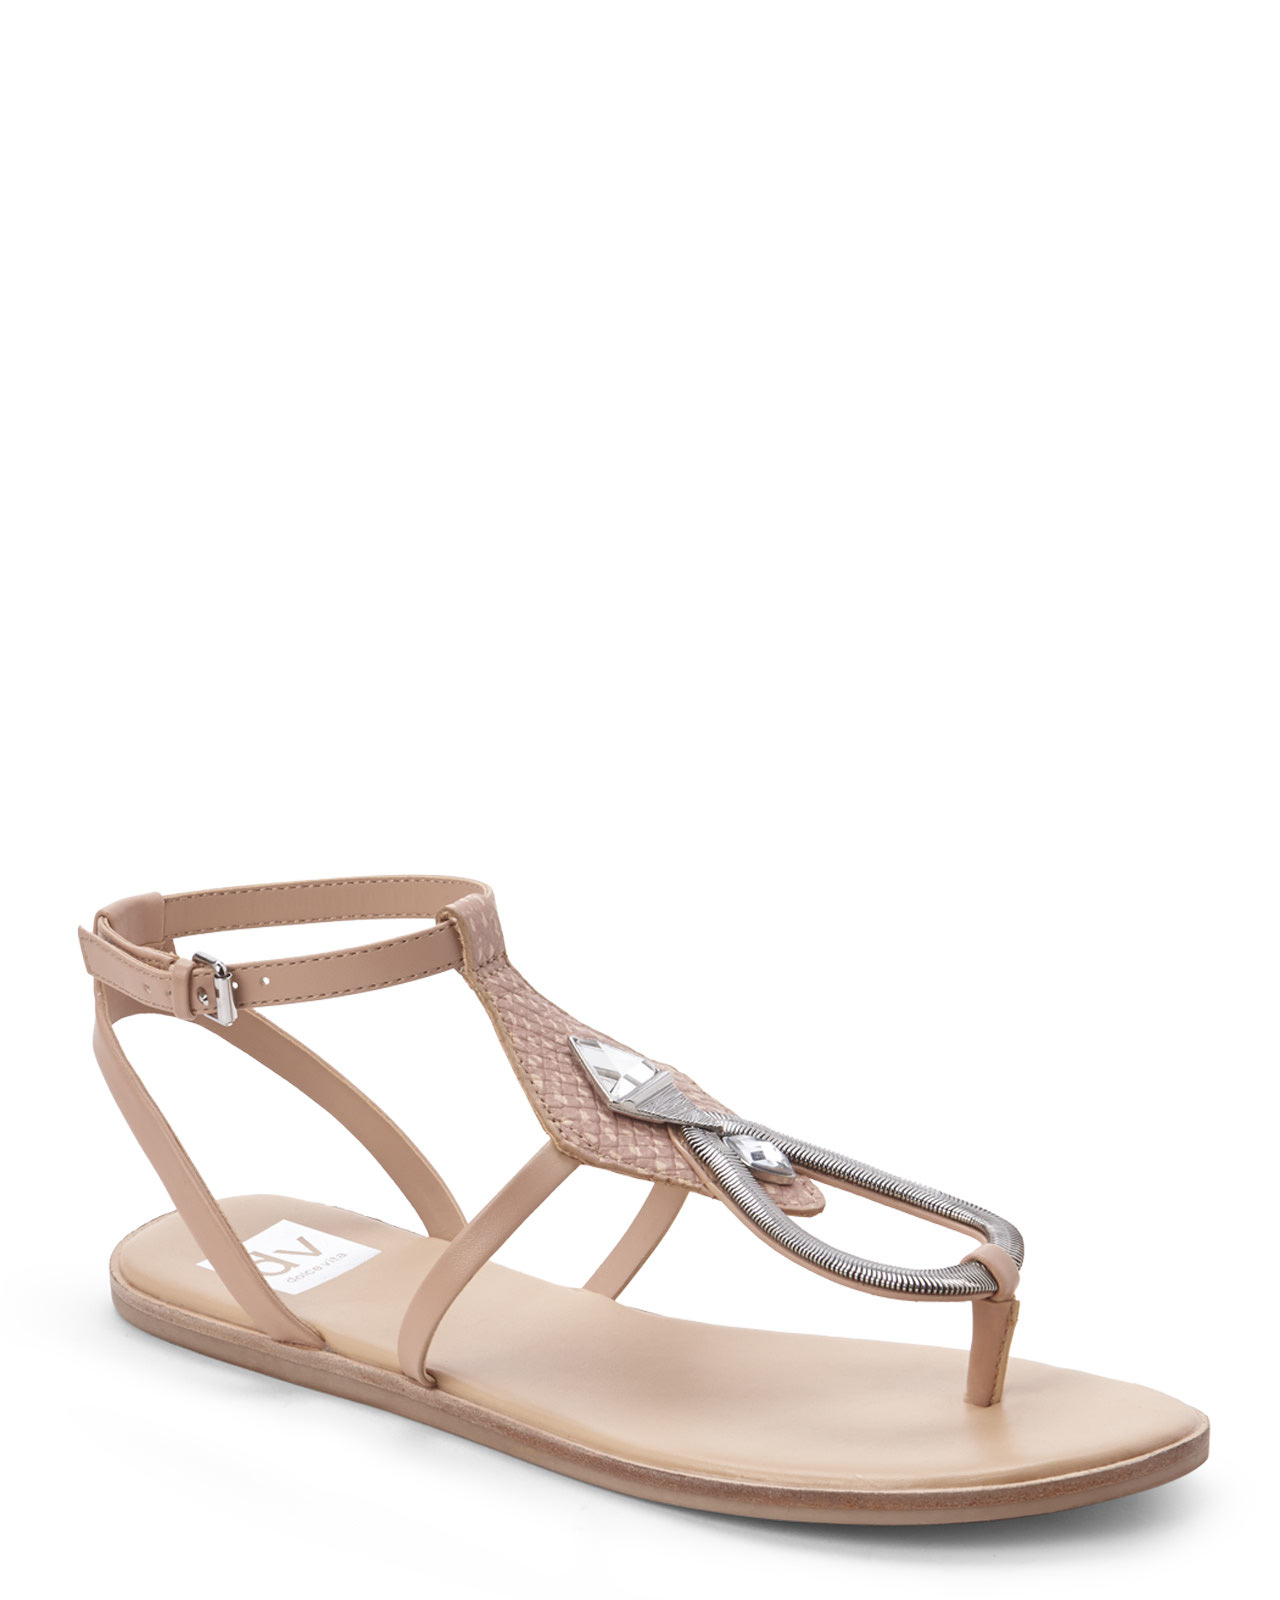 f0d4d1c7028e32 Lyst - Dv By Dolce Vita Pink Cayla Flat Sandal in Pink